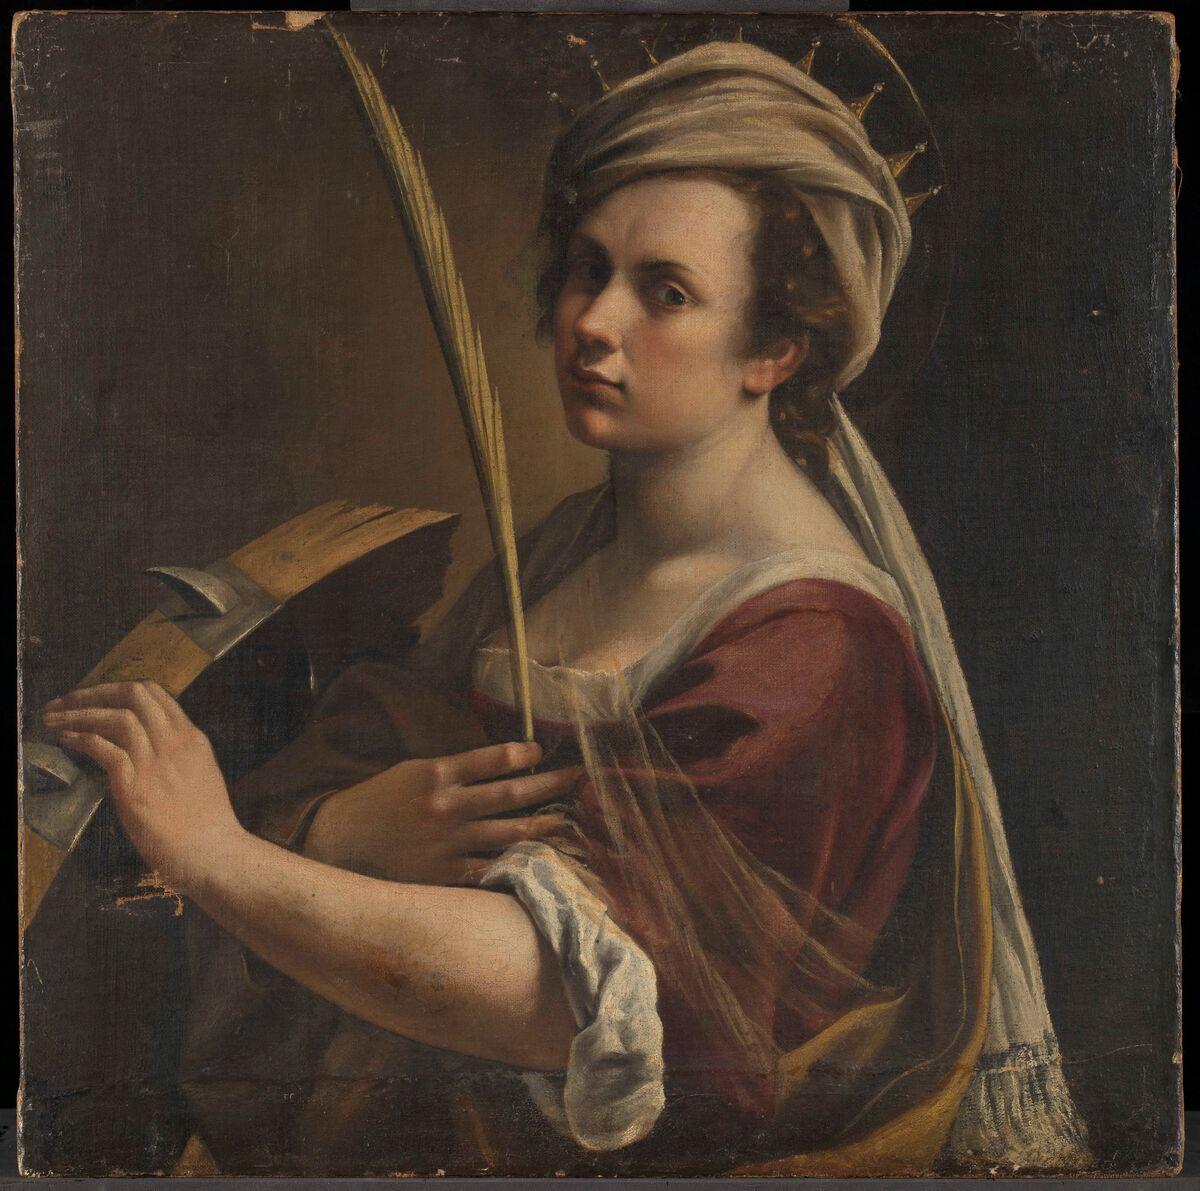 Artemisia Gentileschi, Self Portrait as Saint Catherine of Alexandria, c. 1615–17. © The National Gallery, London.